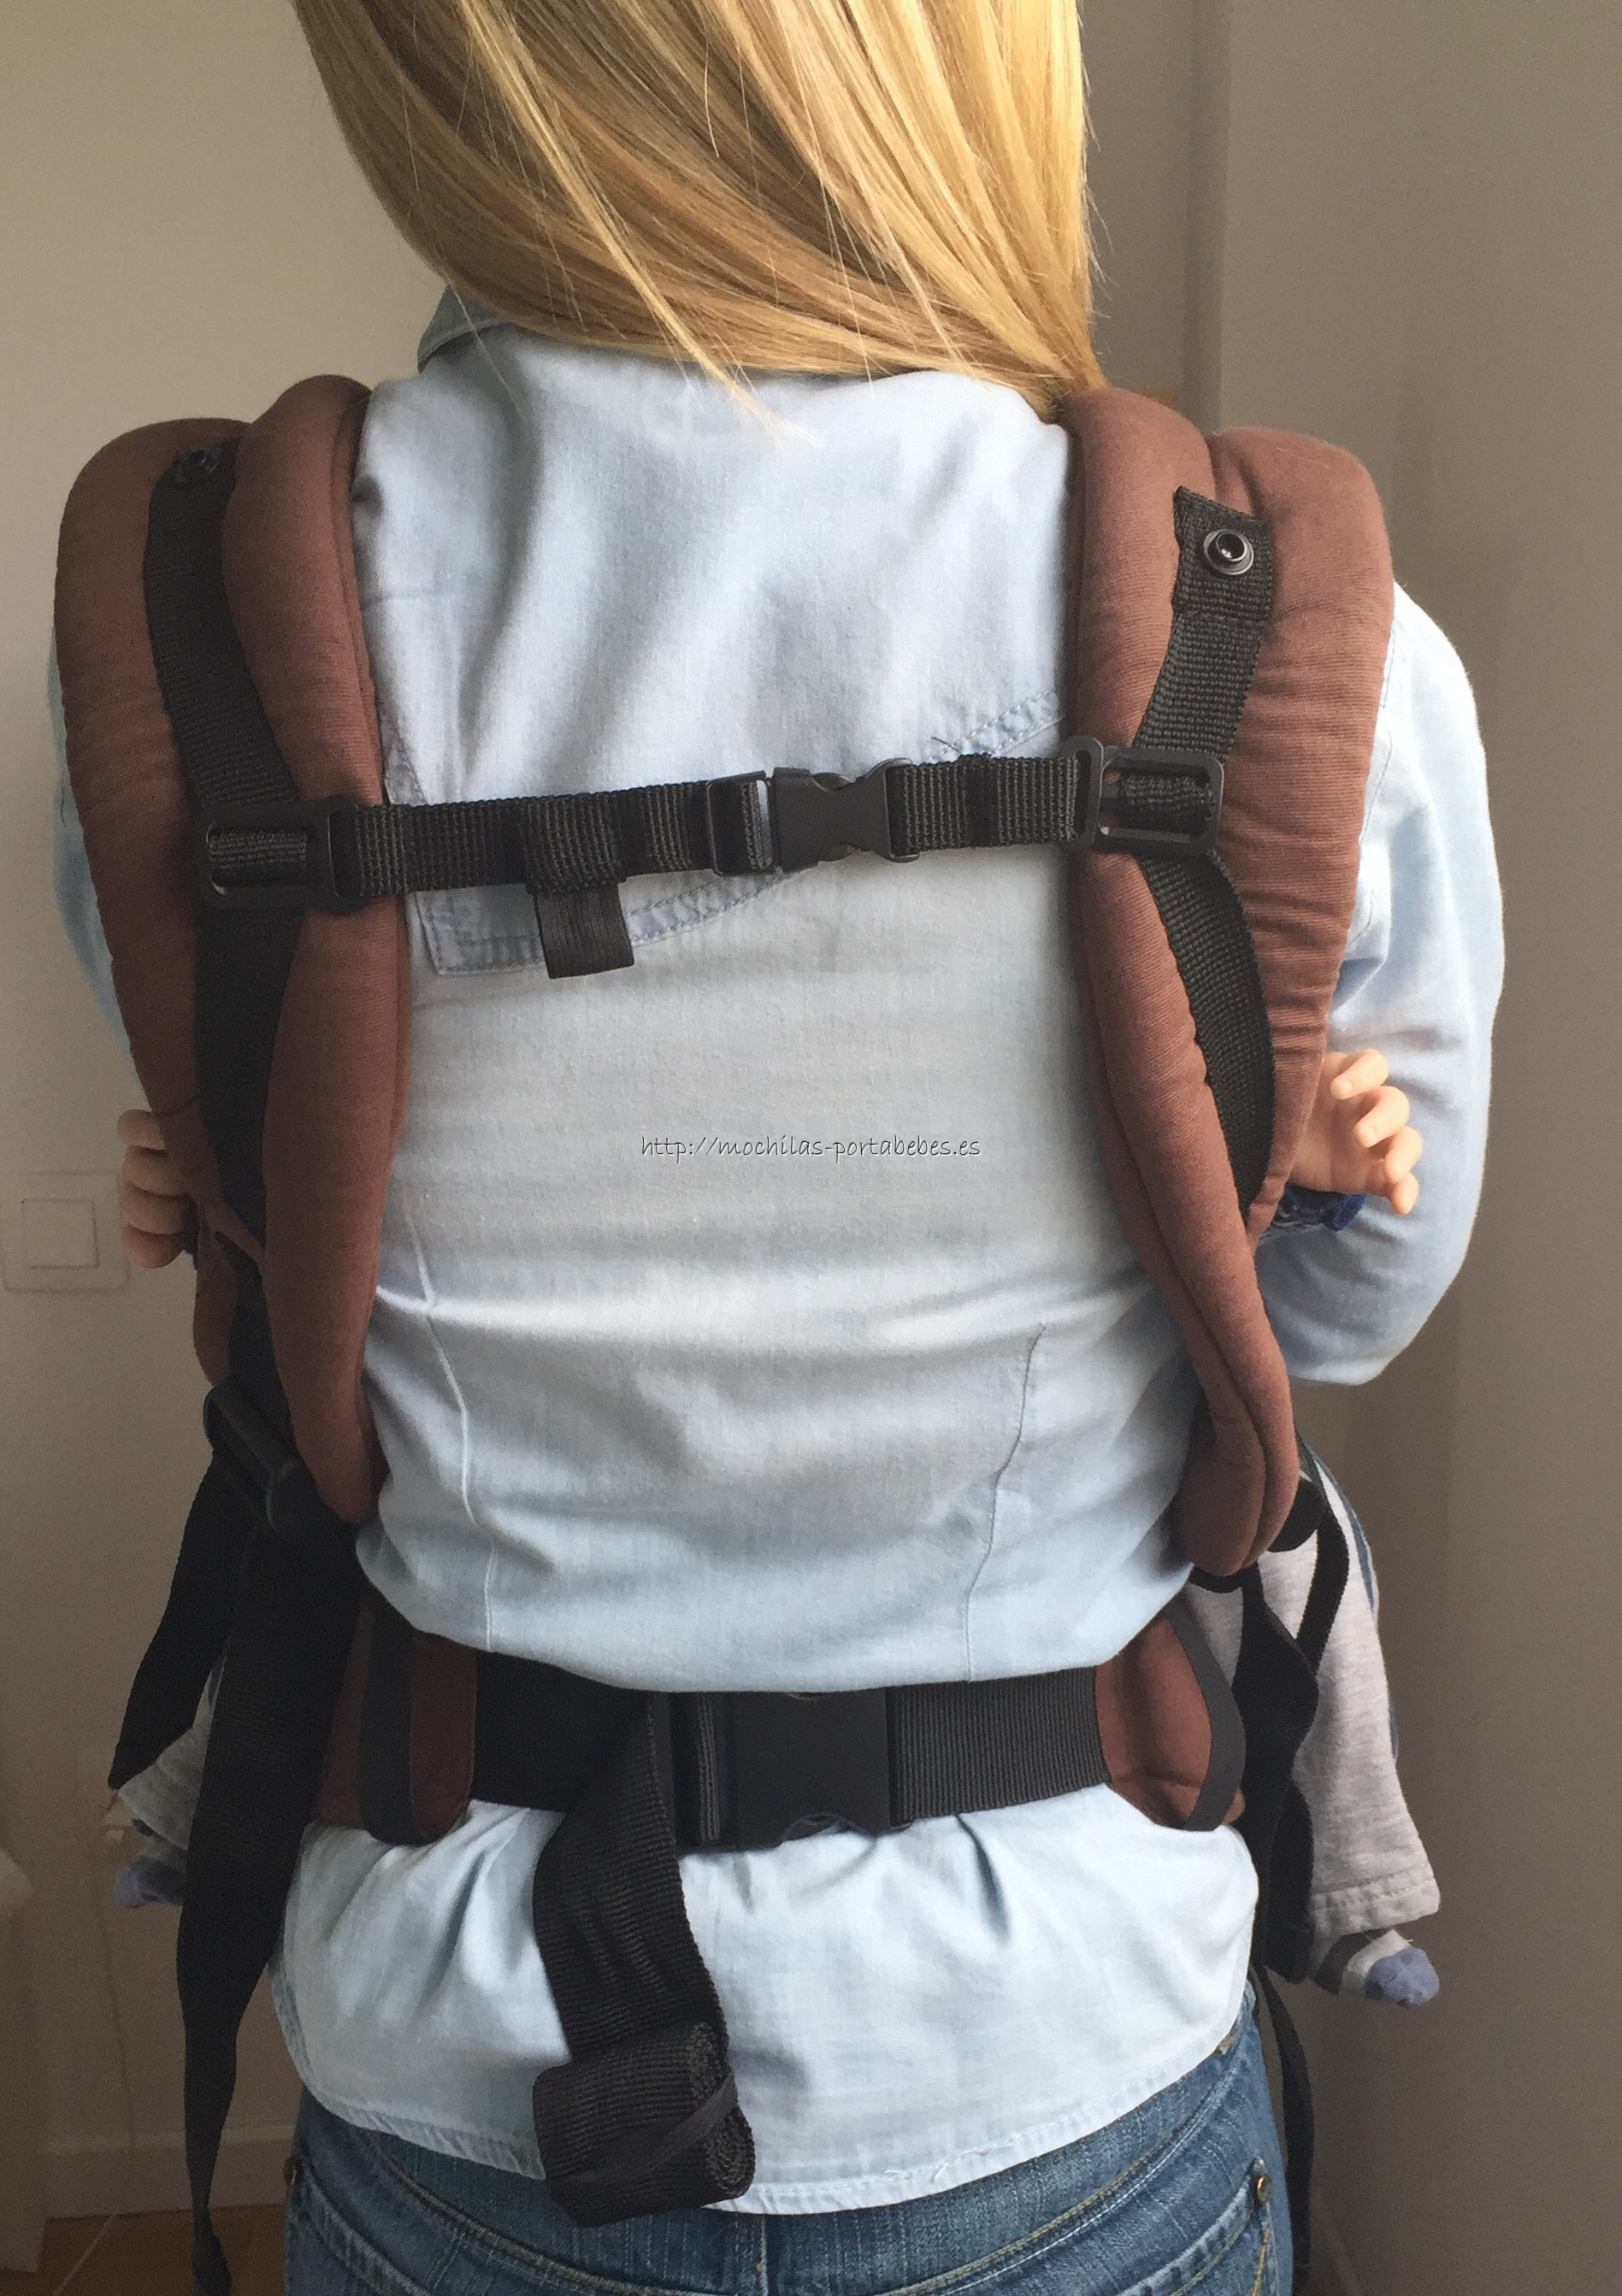 Molto Ergonomic Comfort Carrier detalle de la espalda